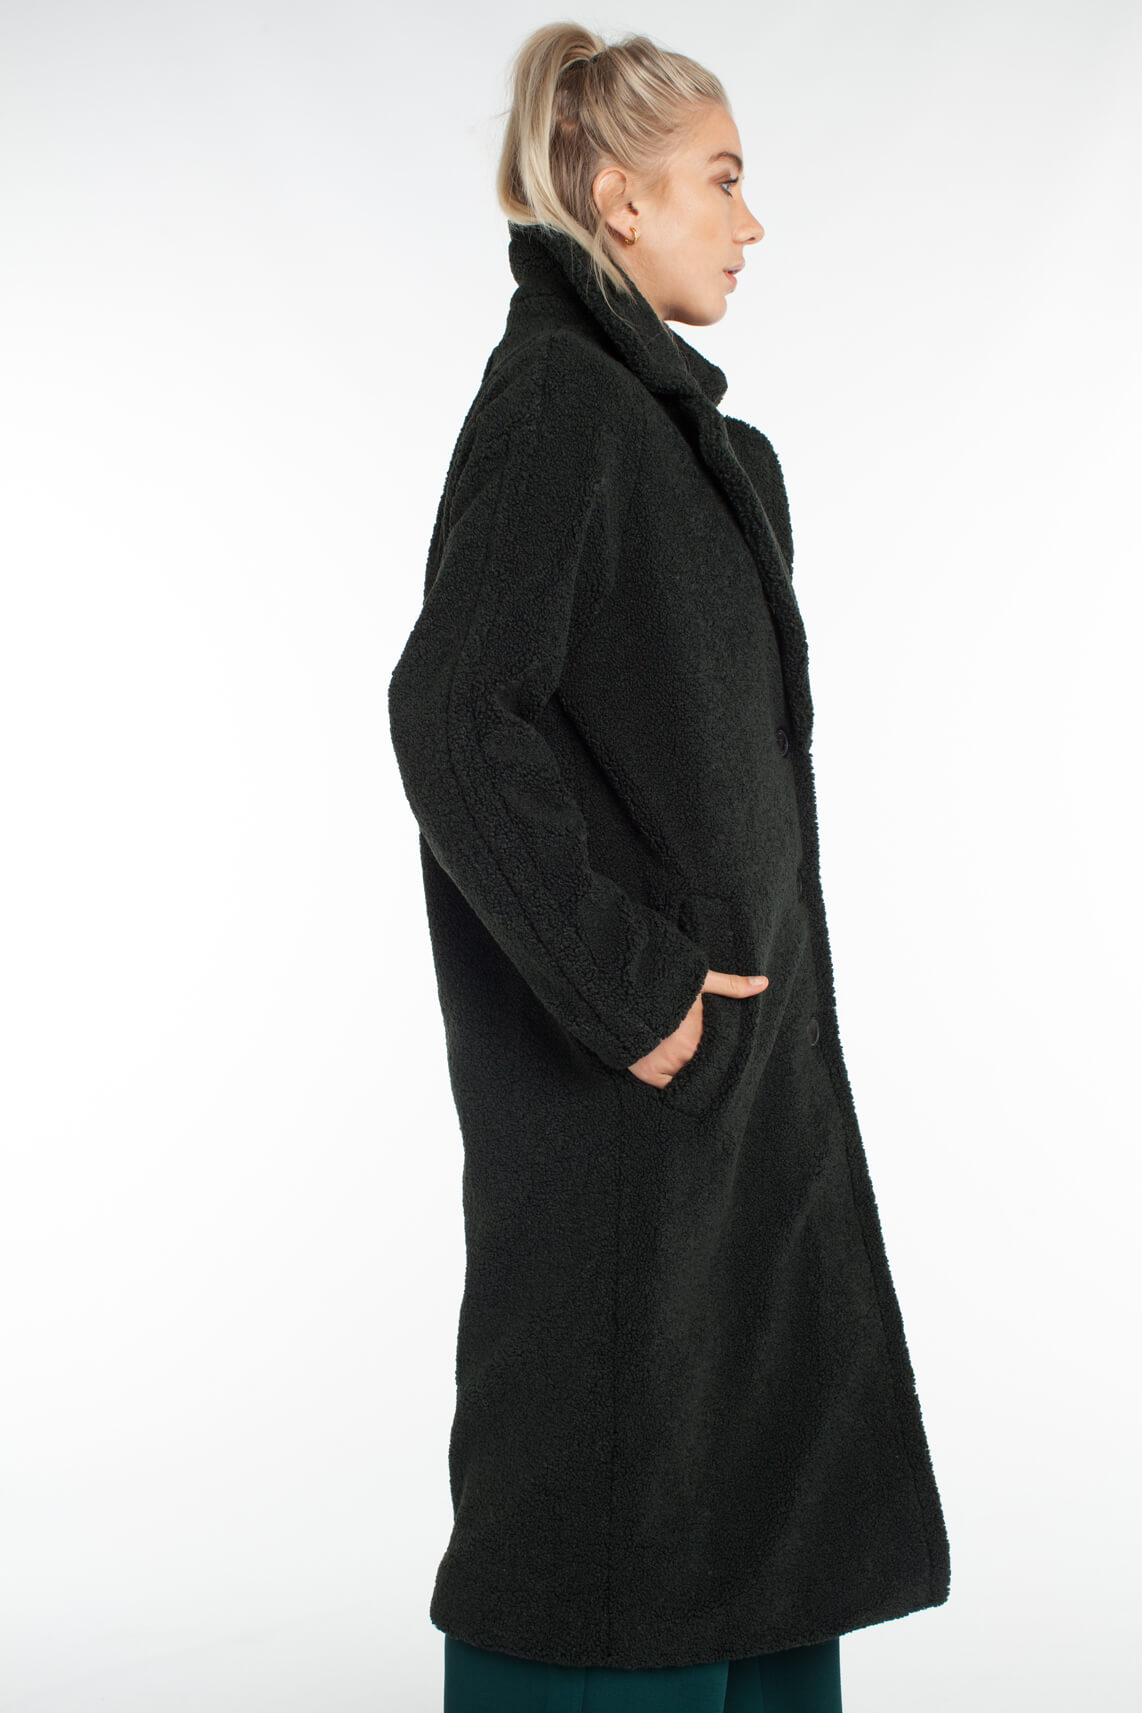 Giacomo Dames Lange teddy mantel groen